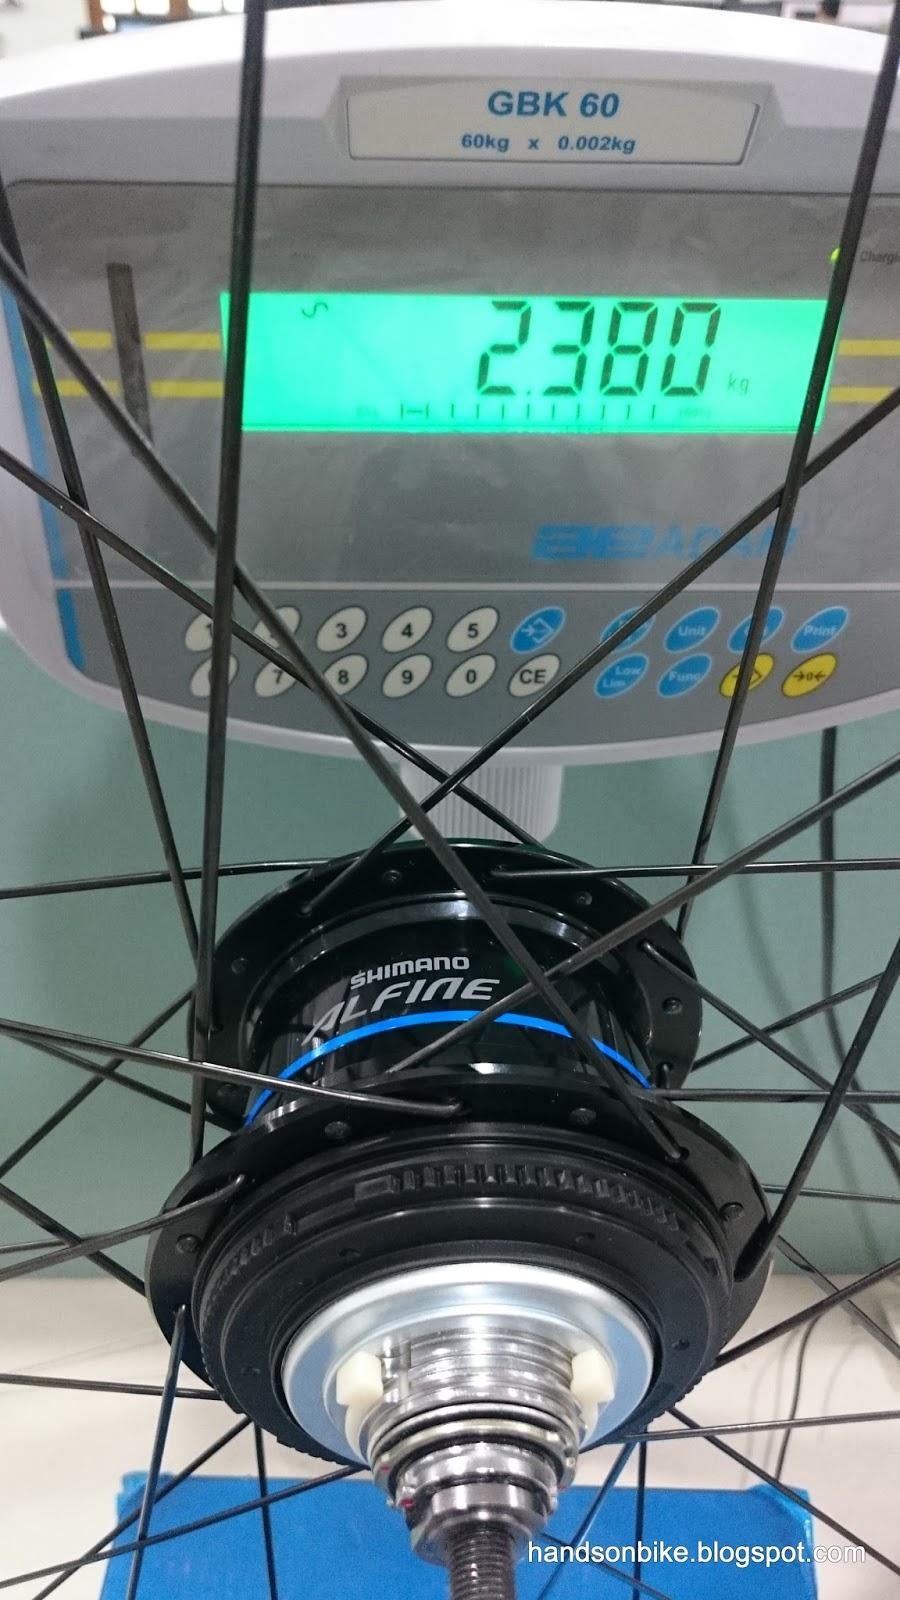 Astounding Hands On Bike Avanti Inc 3 Alfine 11 Di2 Drop Bar Conversion Part 2 Wiring Cloud Ratagdienstapotheekhoekschewaardnl